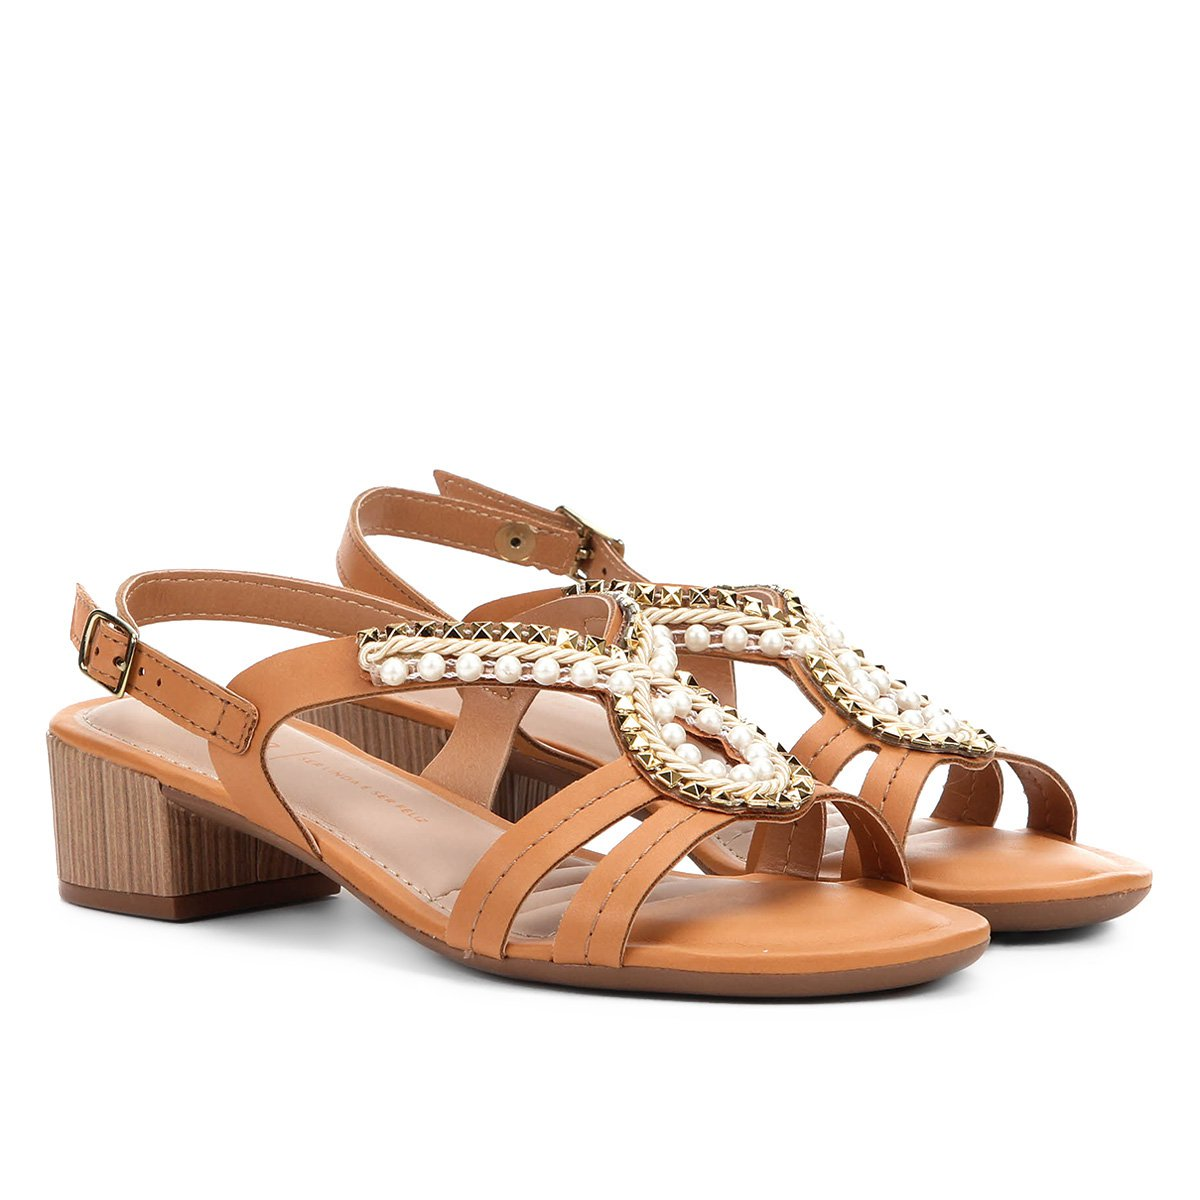 a5cea25ecc Sandália com tachas dakota salto baixo feminina caramelo compre jpg 544x544 Dakota  salto baixo